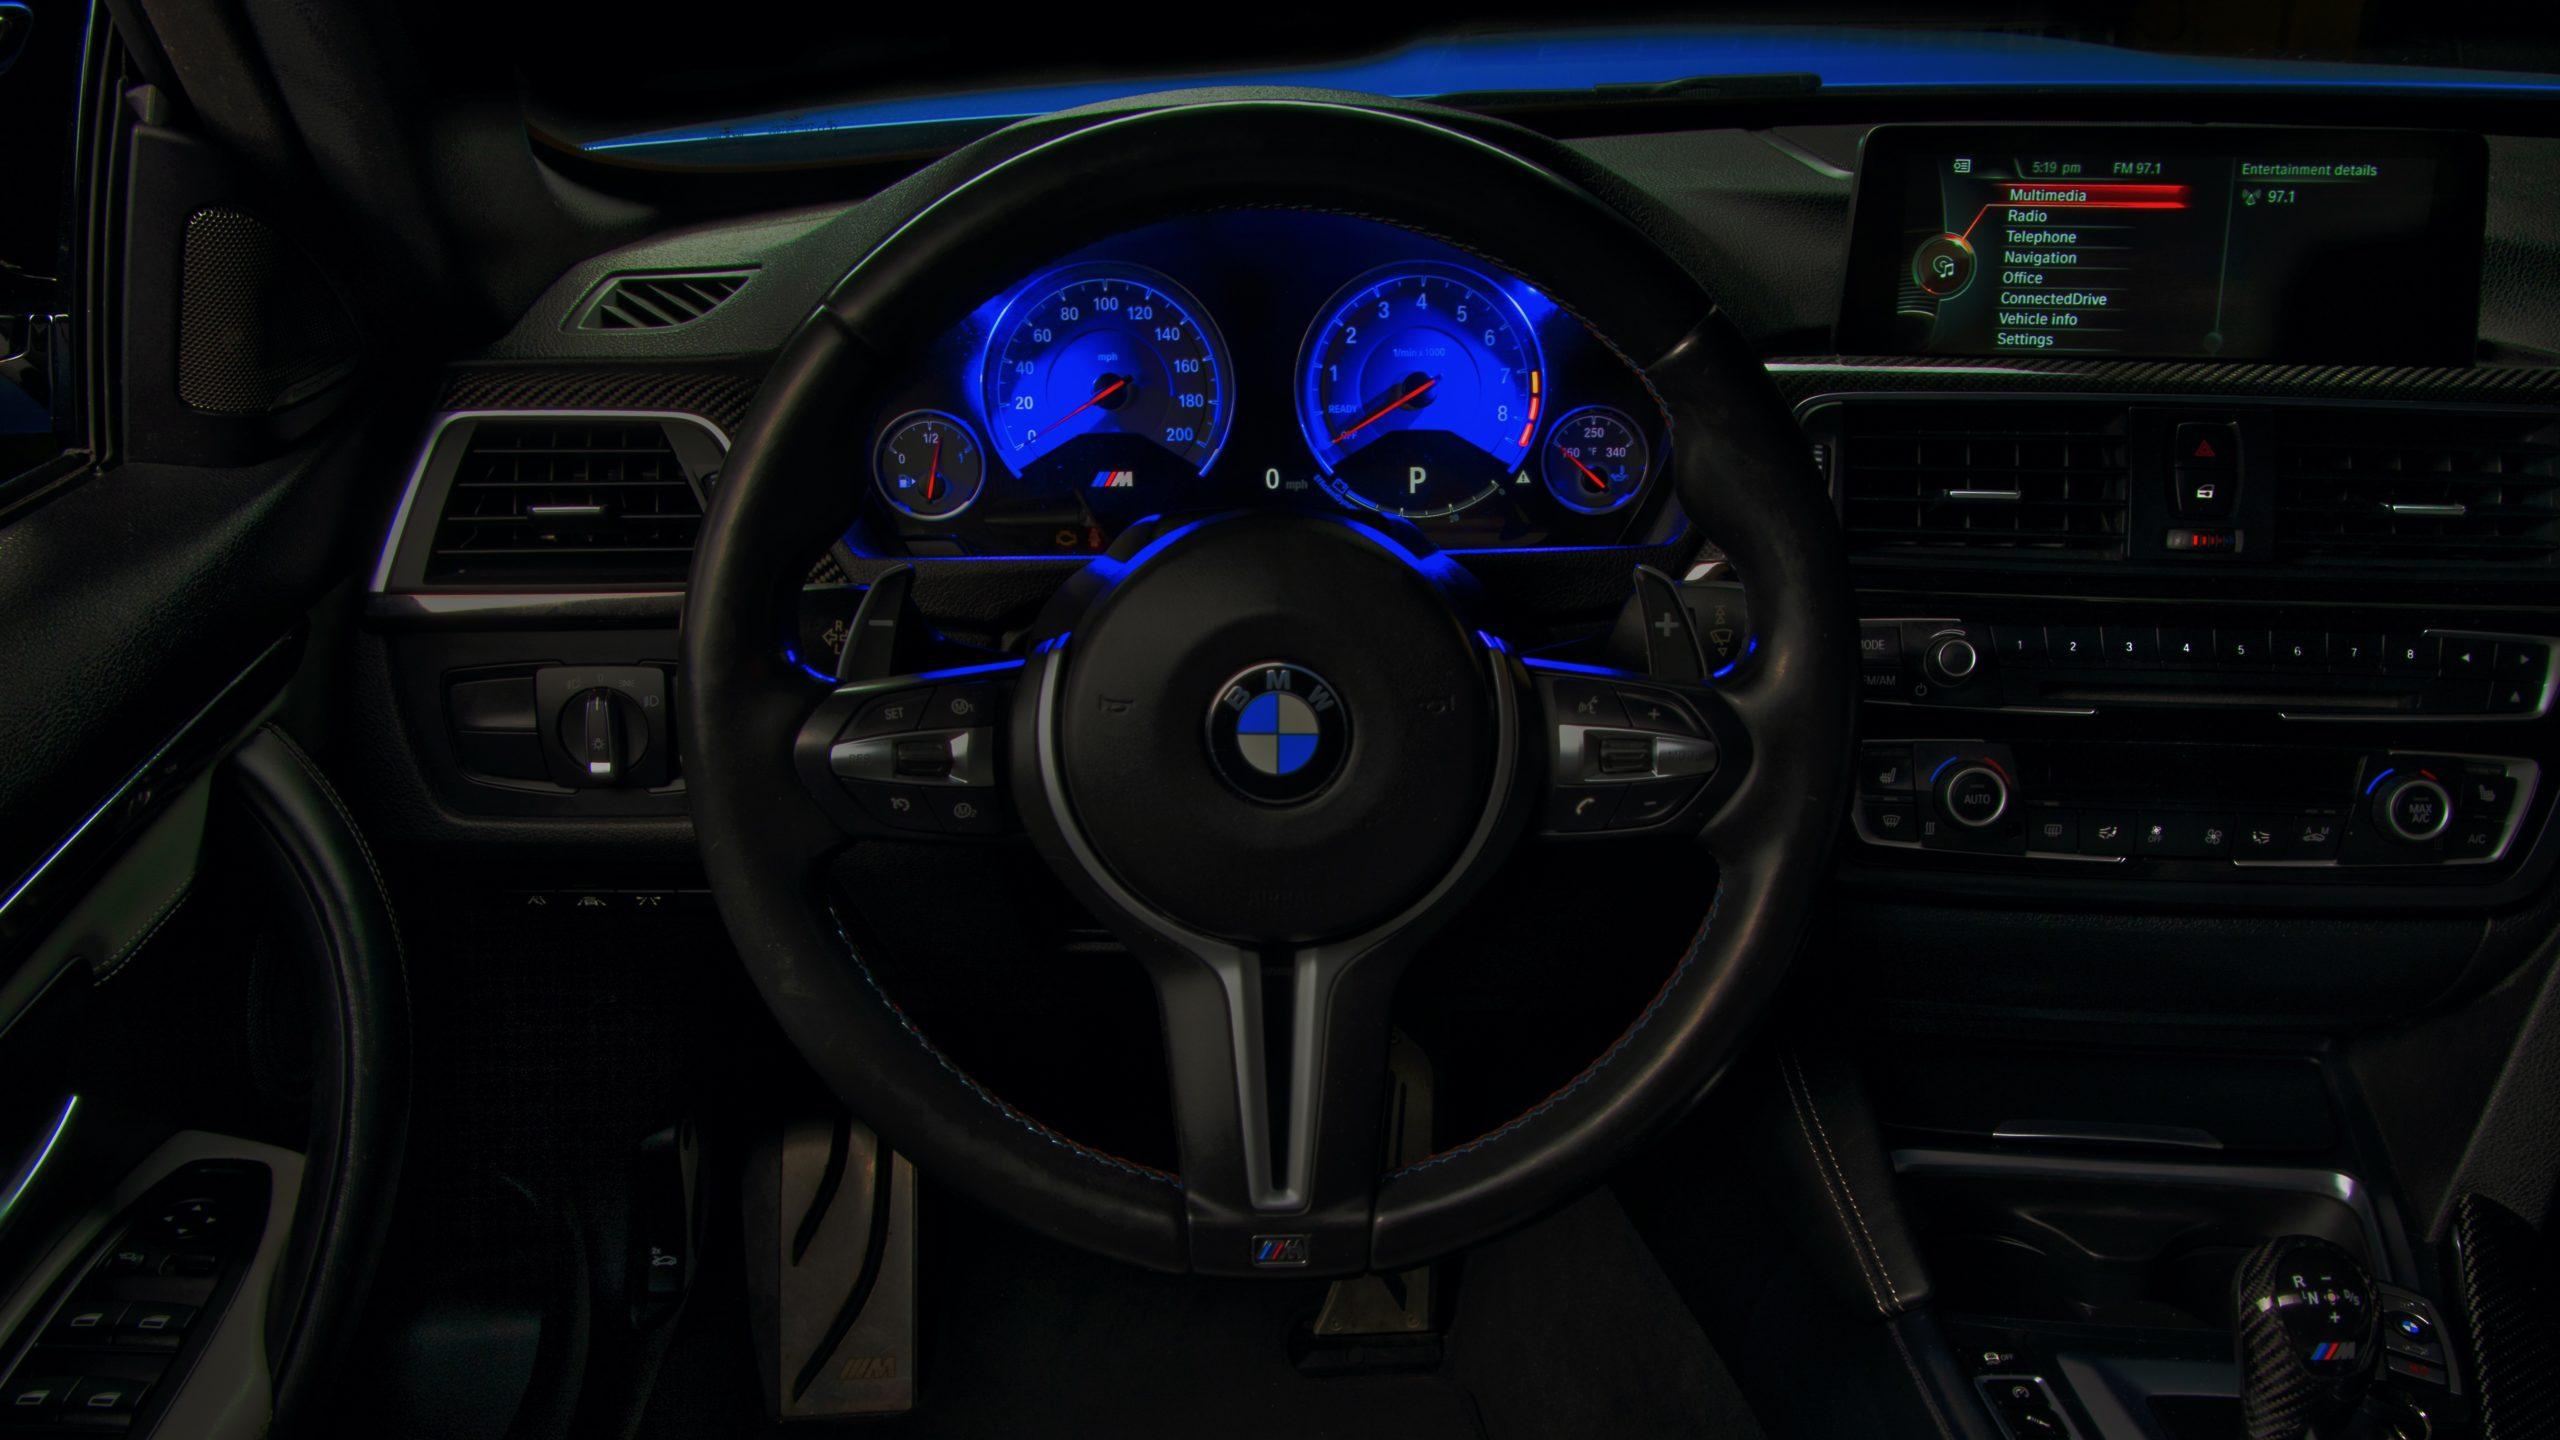 Dashboard of a BMW M4 with K40 Electronics Radar Installed